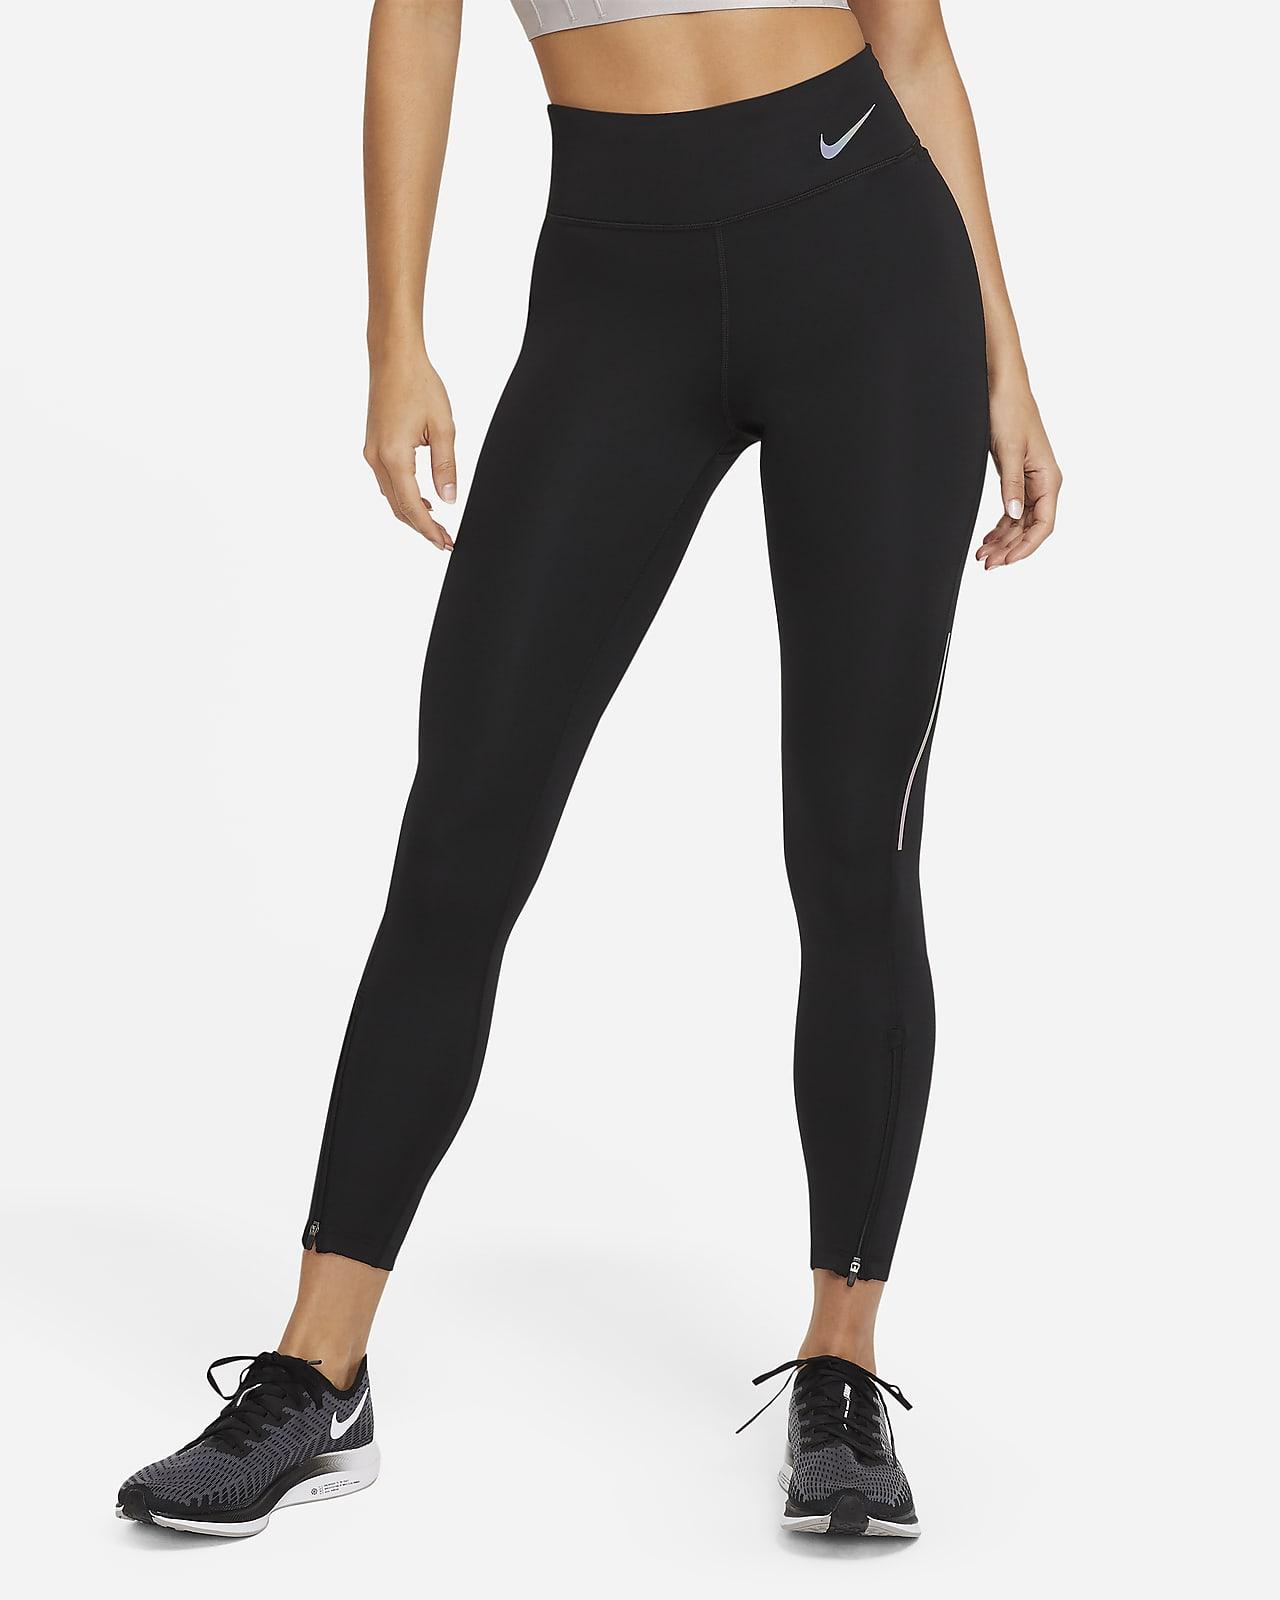 Legging de running 7/8 taille mi-basse Nike Epic Faster pour Femme